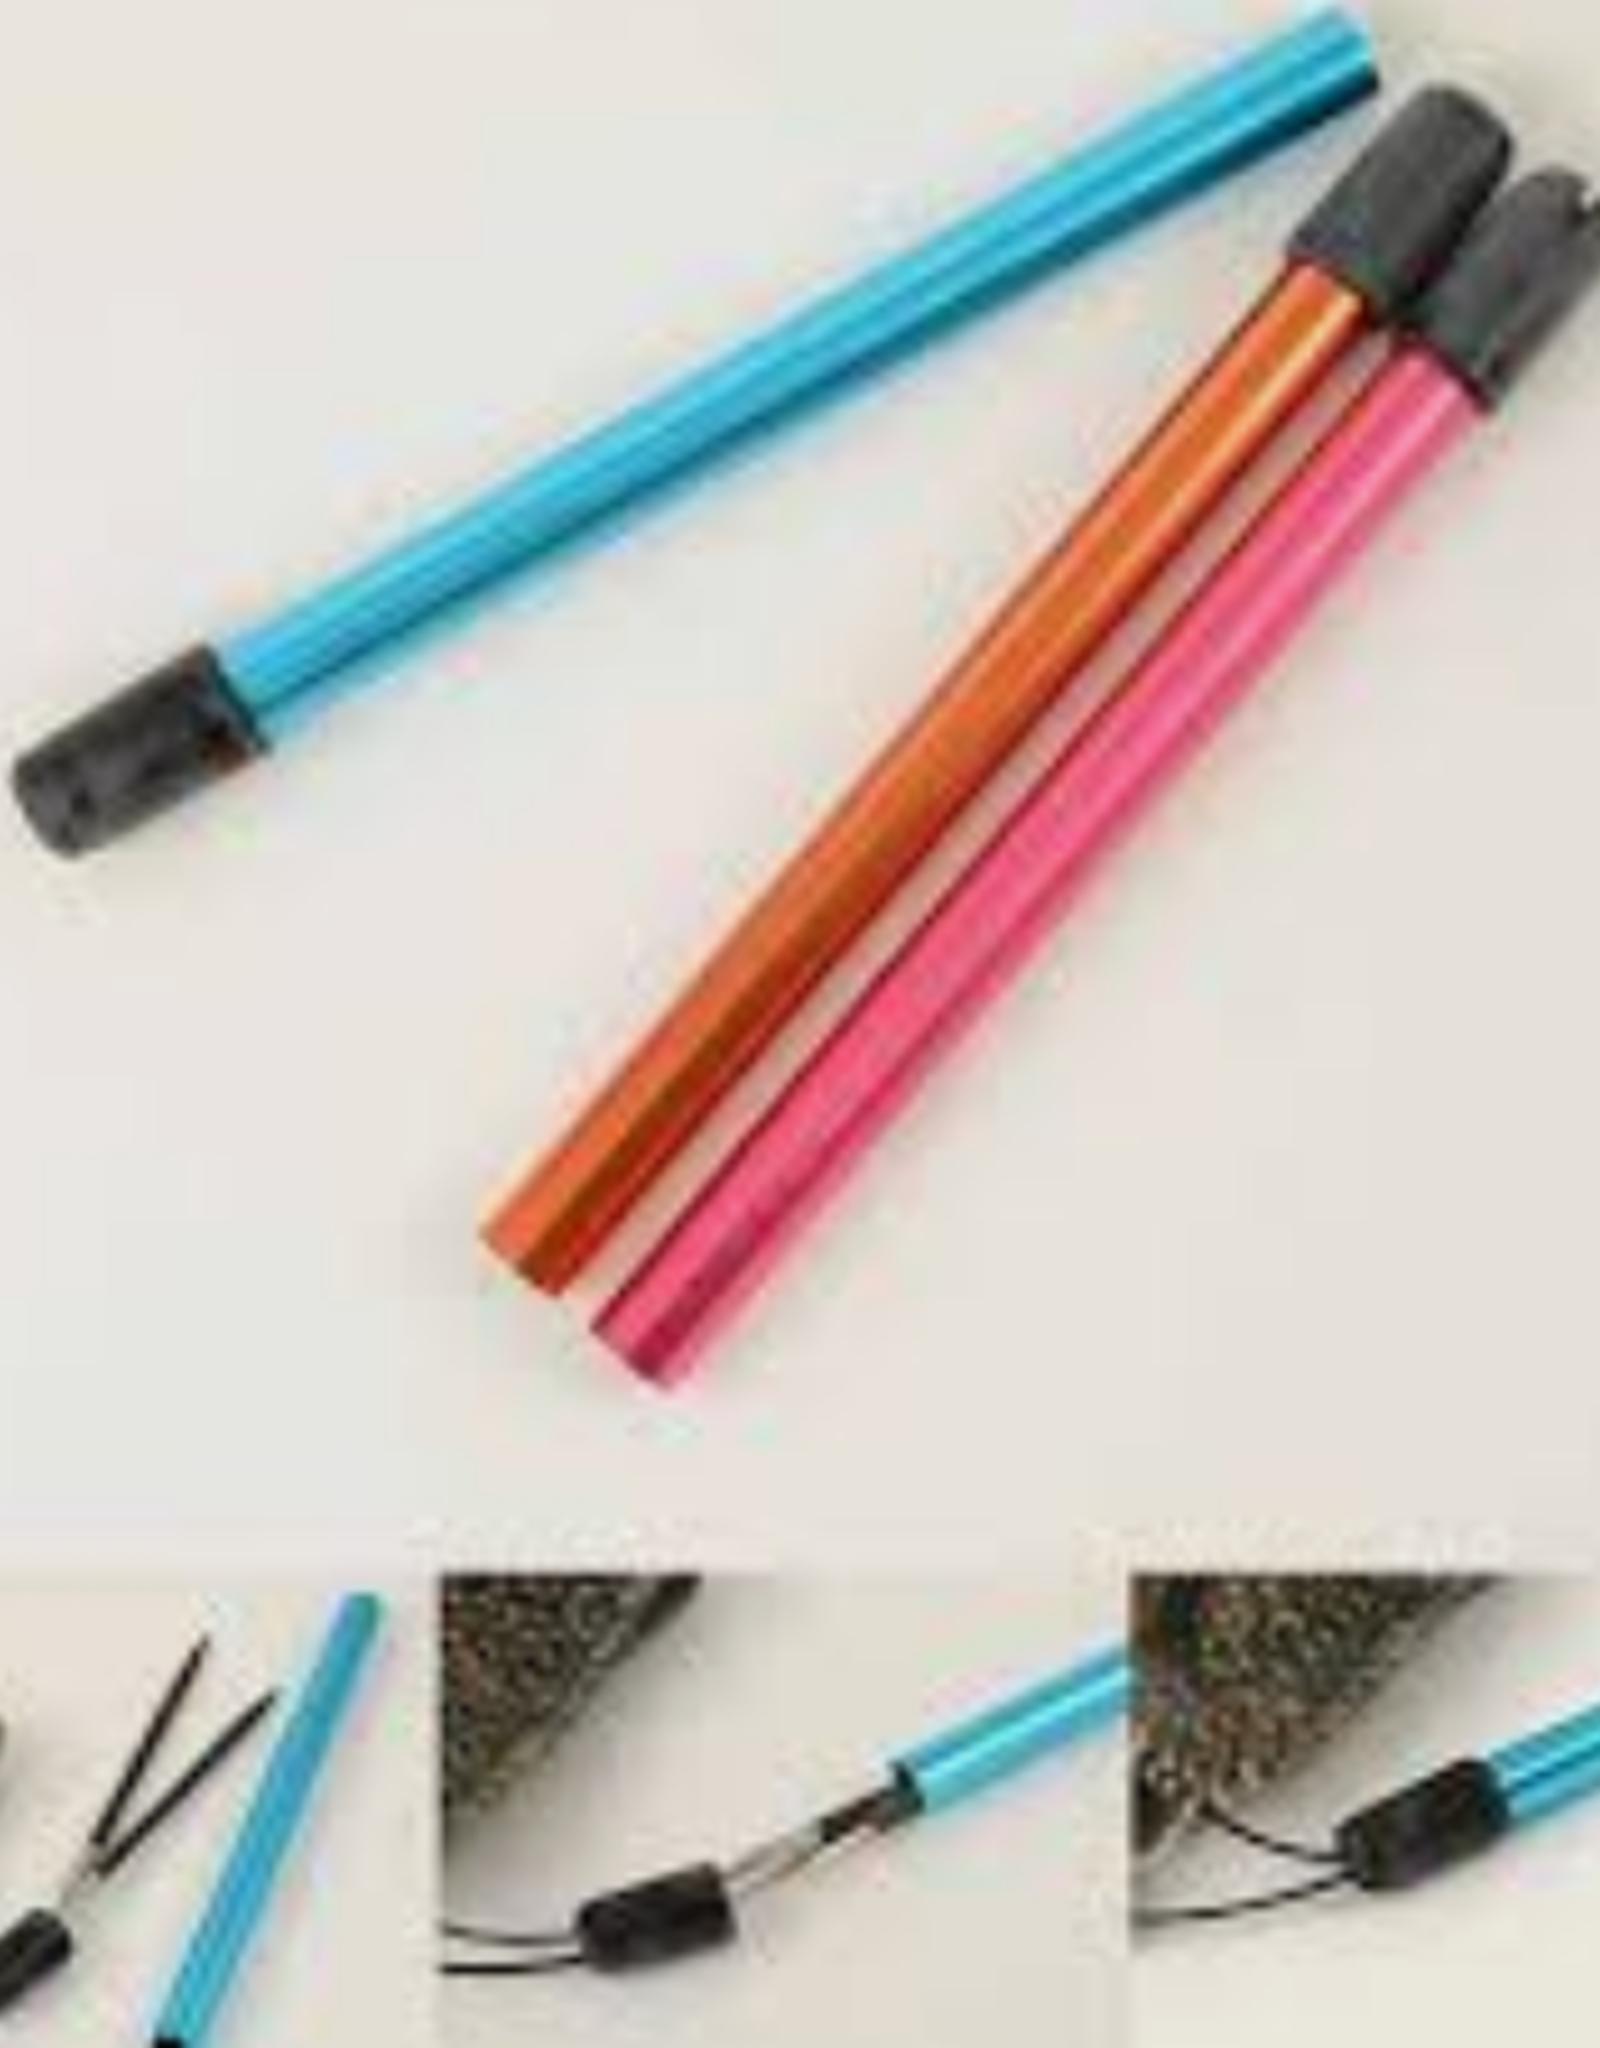 Knitter's Pride Circular Needle Protectors (Tube)